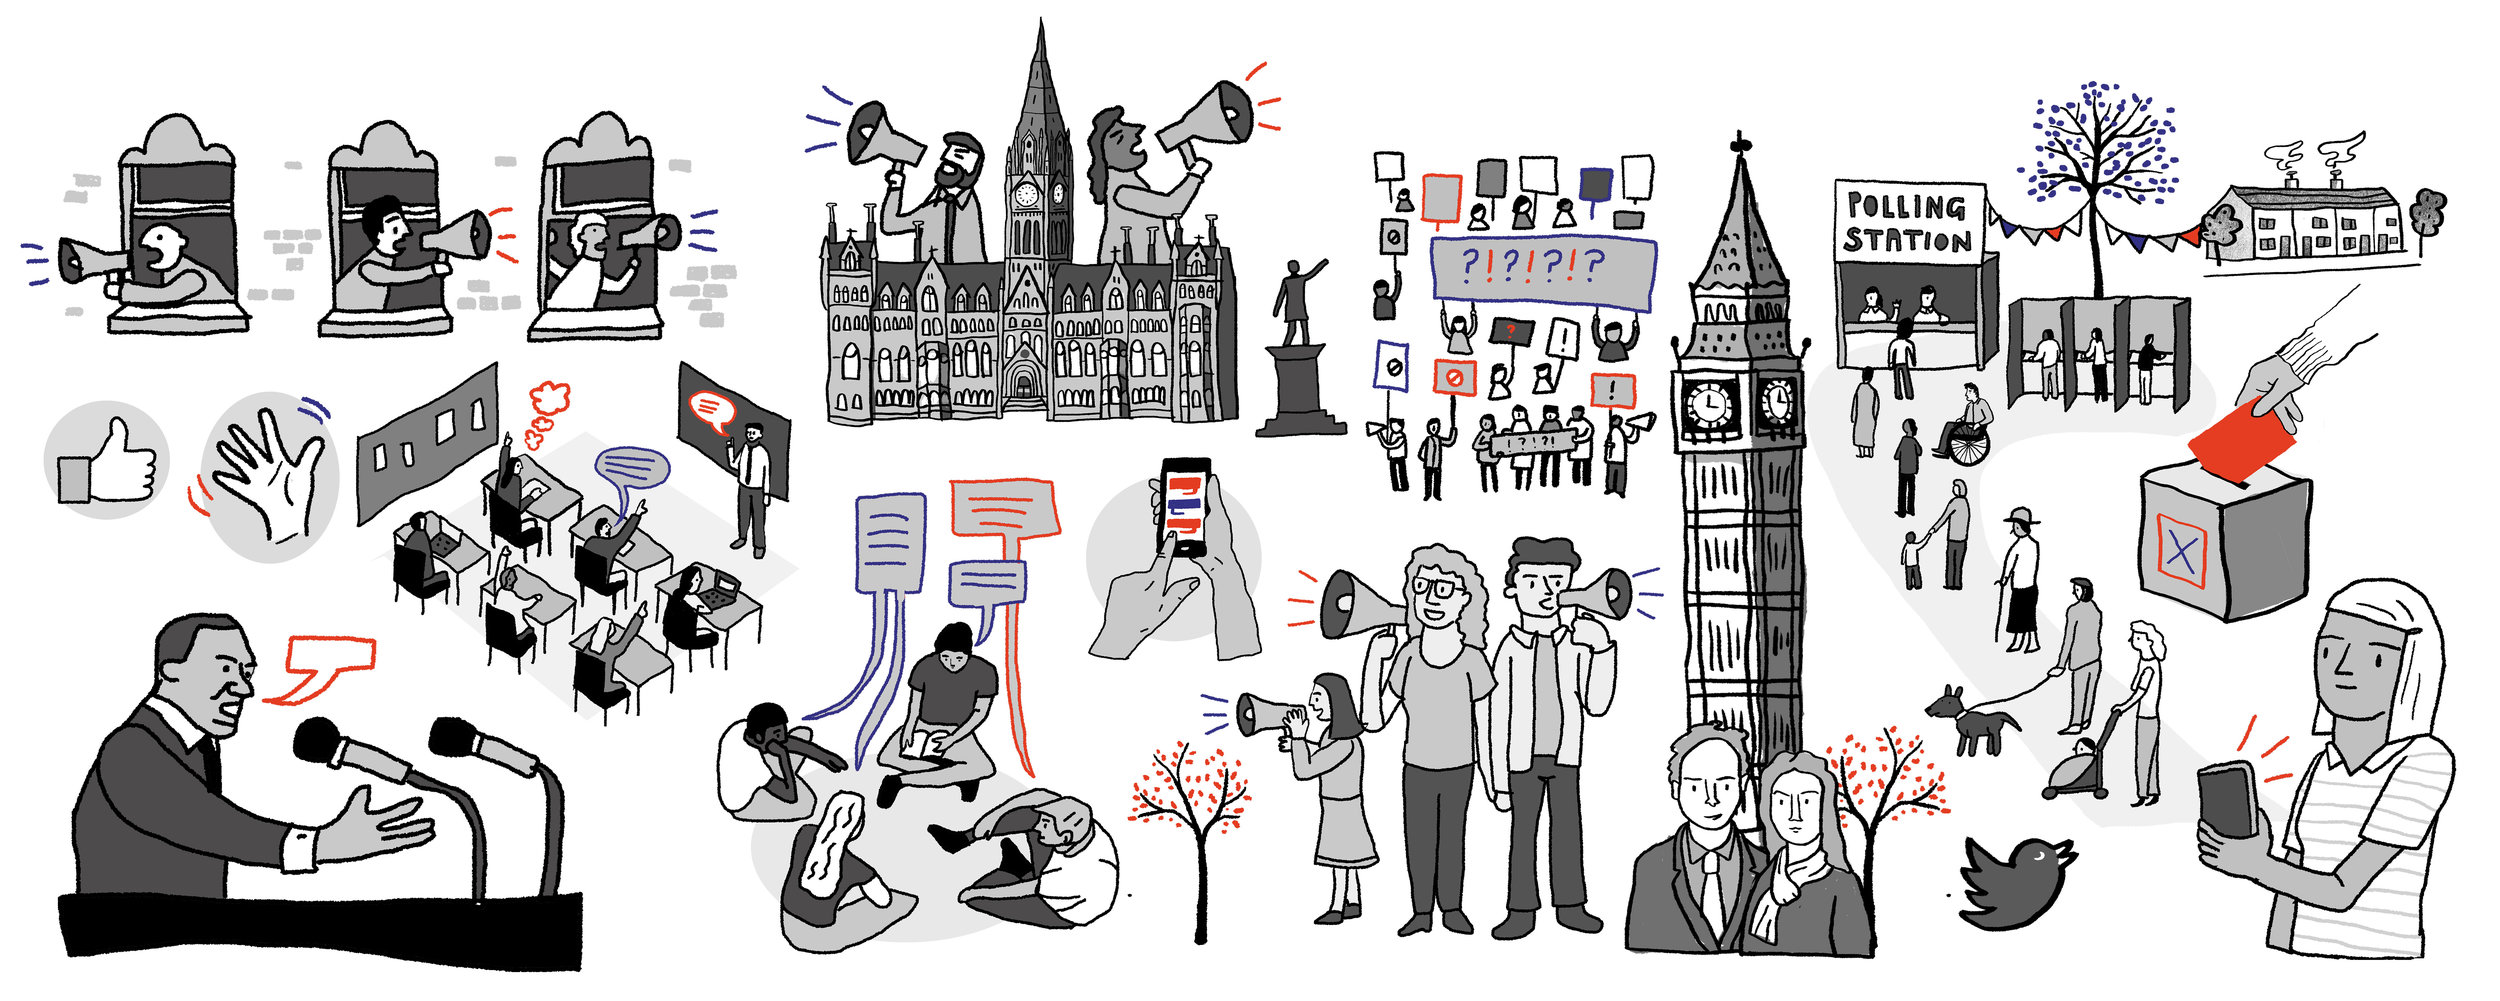 PP Web Illustration Final.jpg